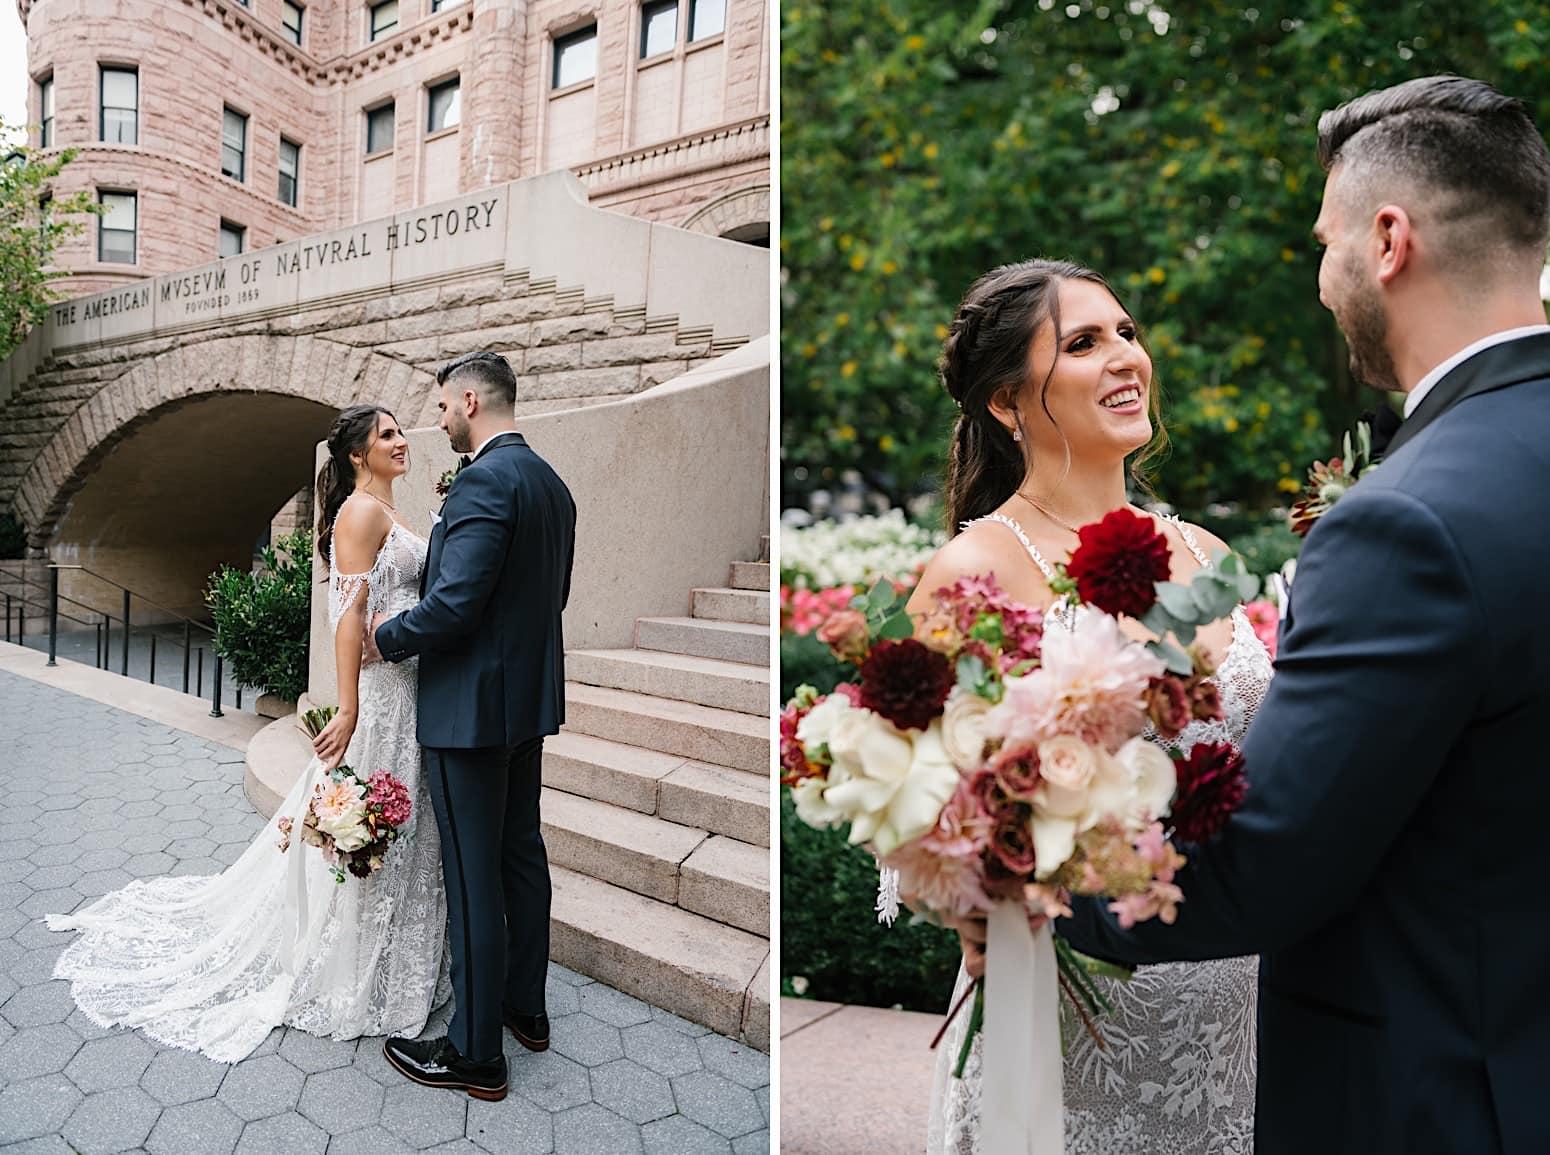 A Treehouse for Dreaming wedding in Central Park NYC (aka Dene Summerhouse wedding)